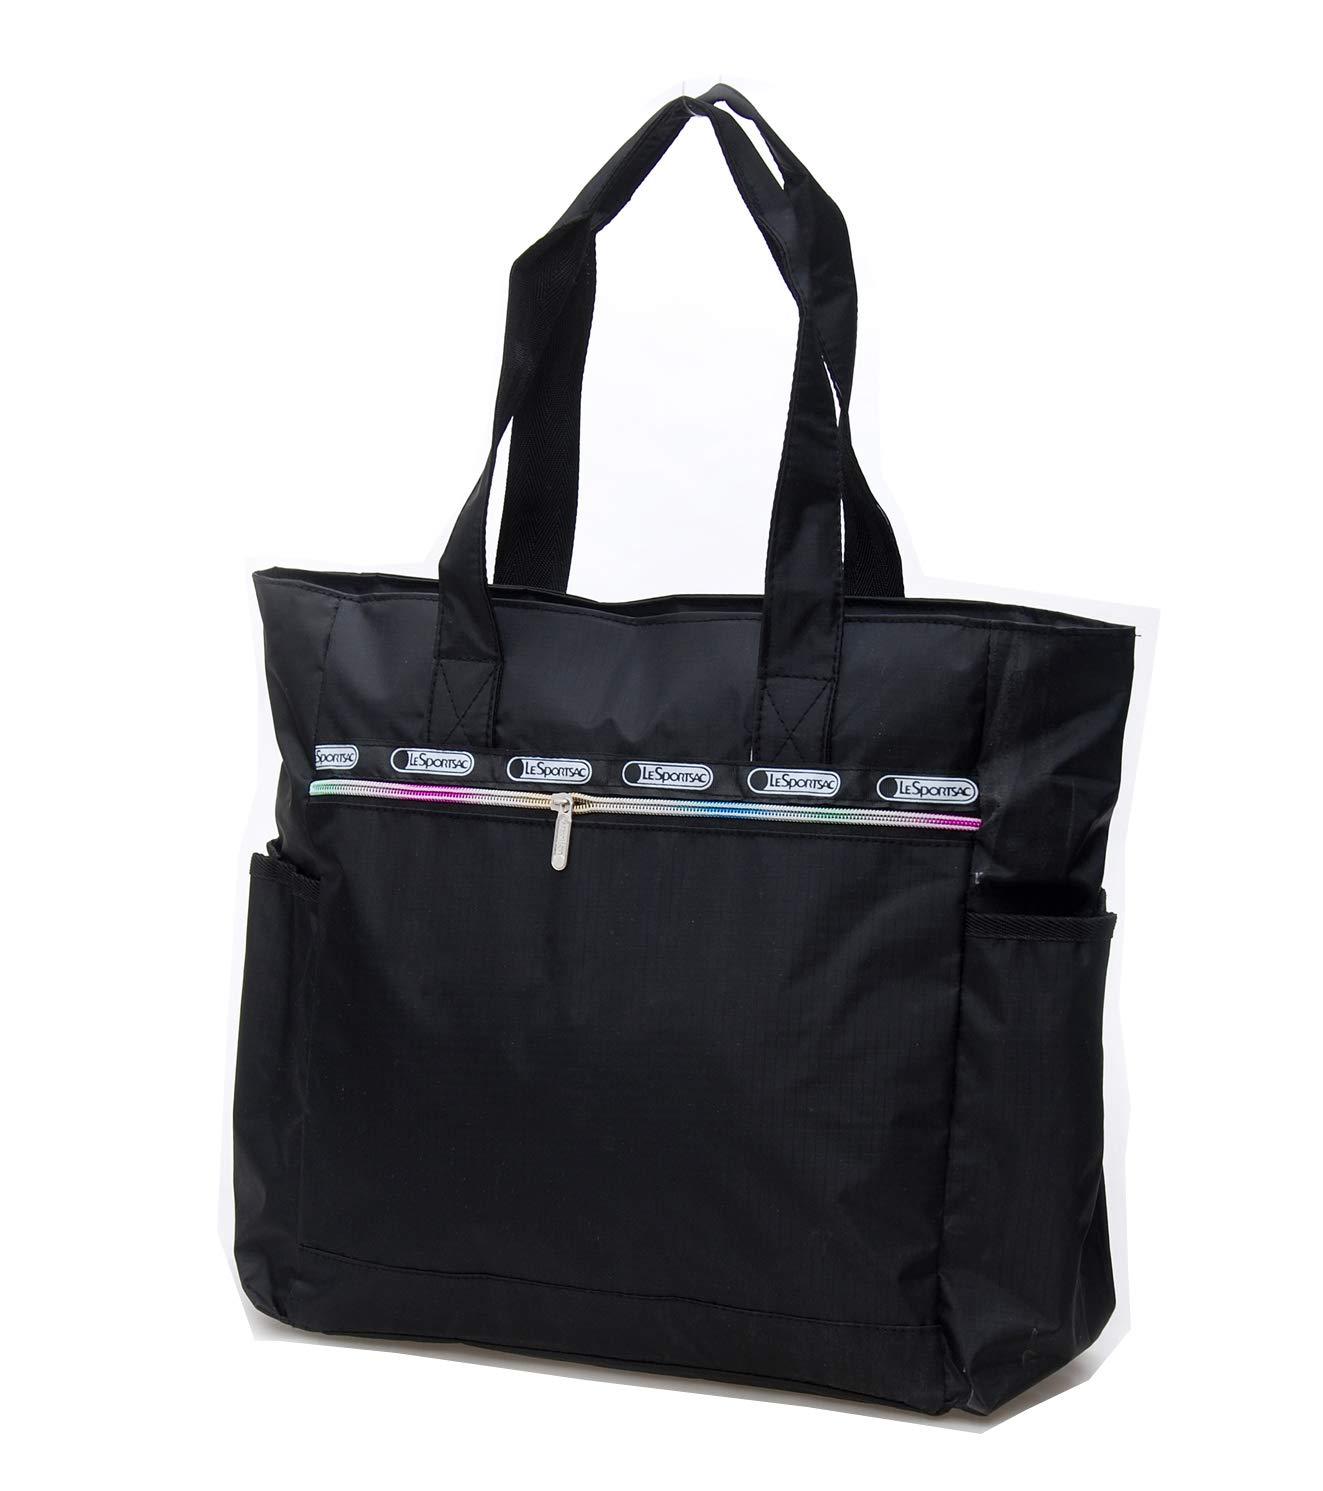 Nylon Large Lightweight Tote Bag Shoulder Bag for Gym Hiking Picnic Travel Beach Waterproof Tote Bags (Black TB)